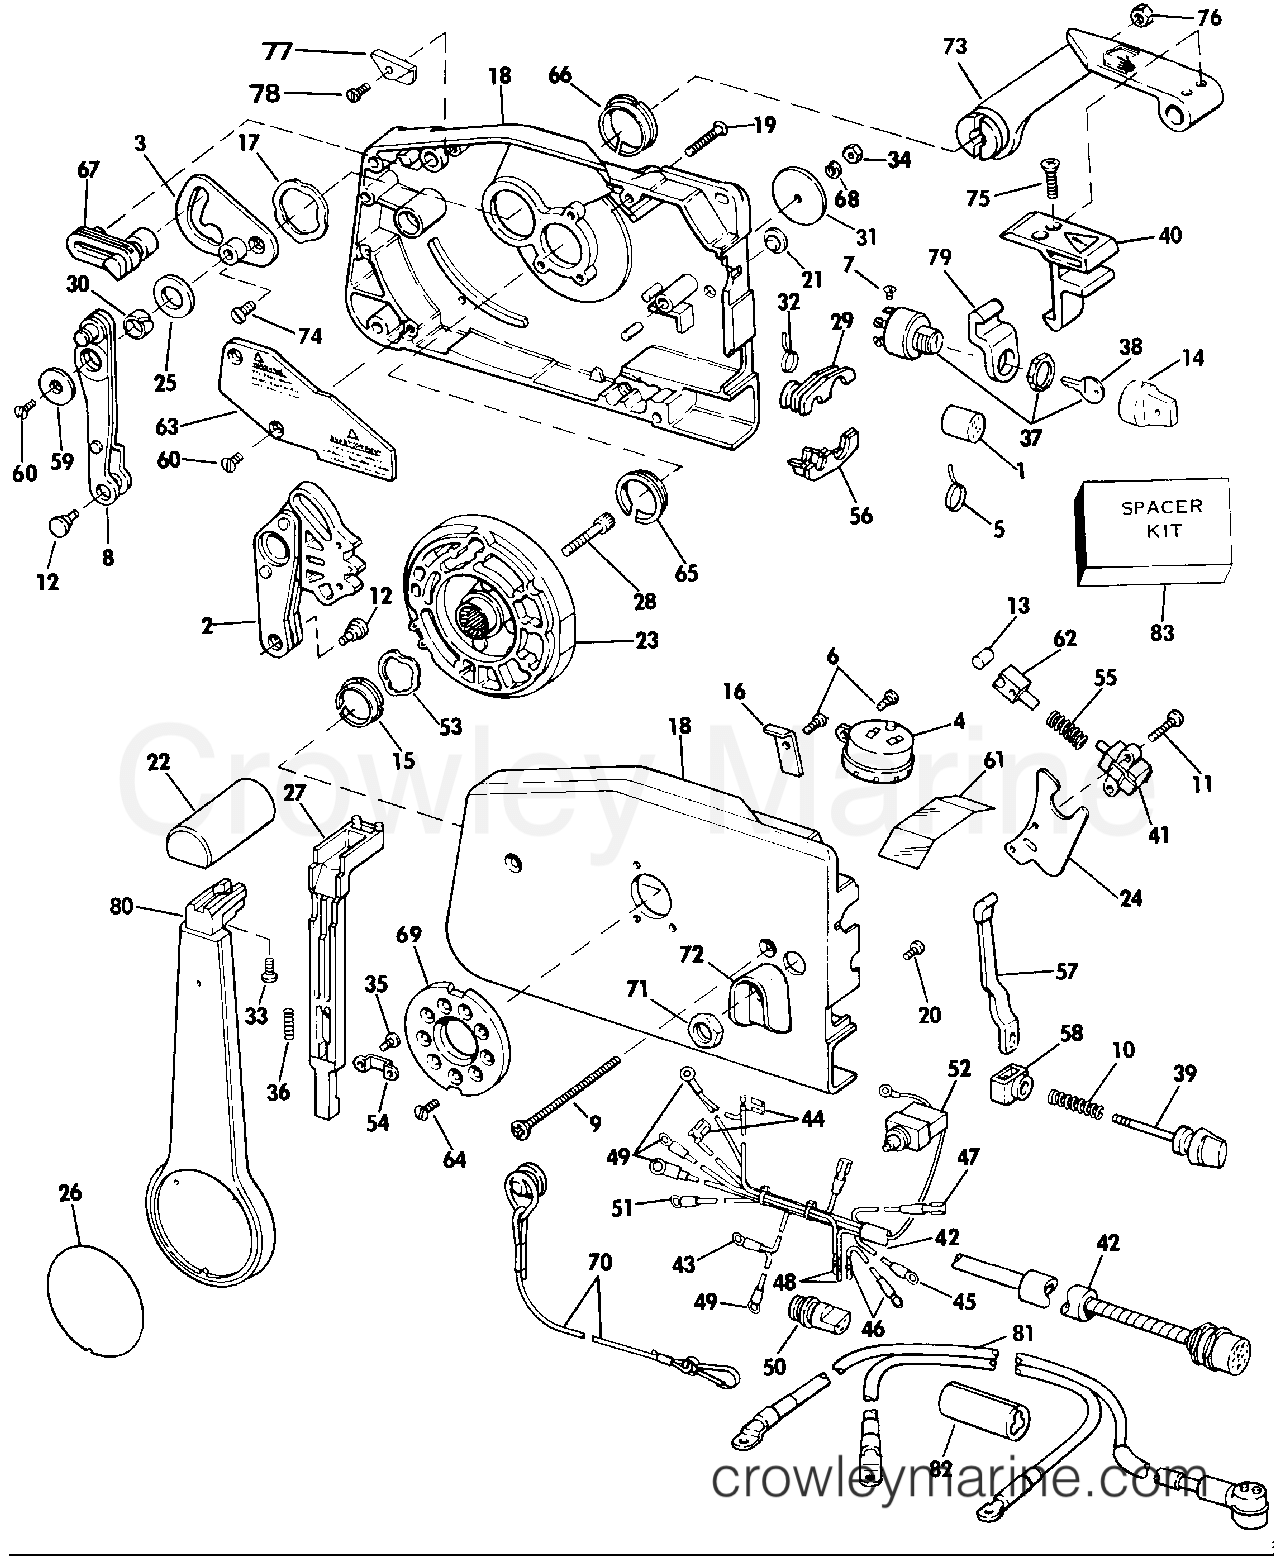 1986 Evinrude Outboards 35 - E35RCDM - REMOTE CONTROL section